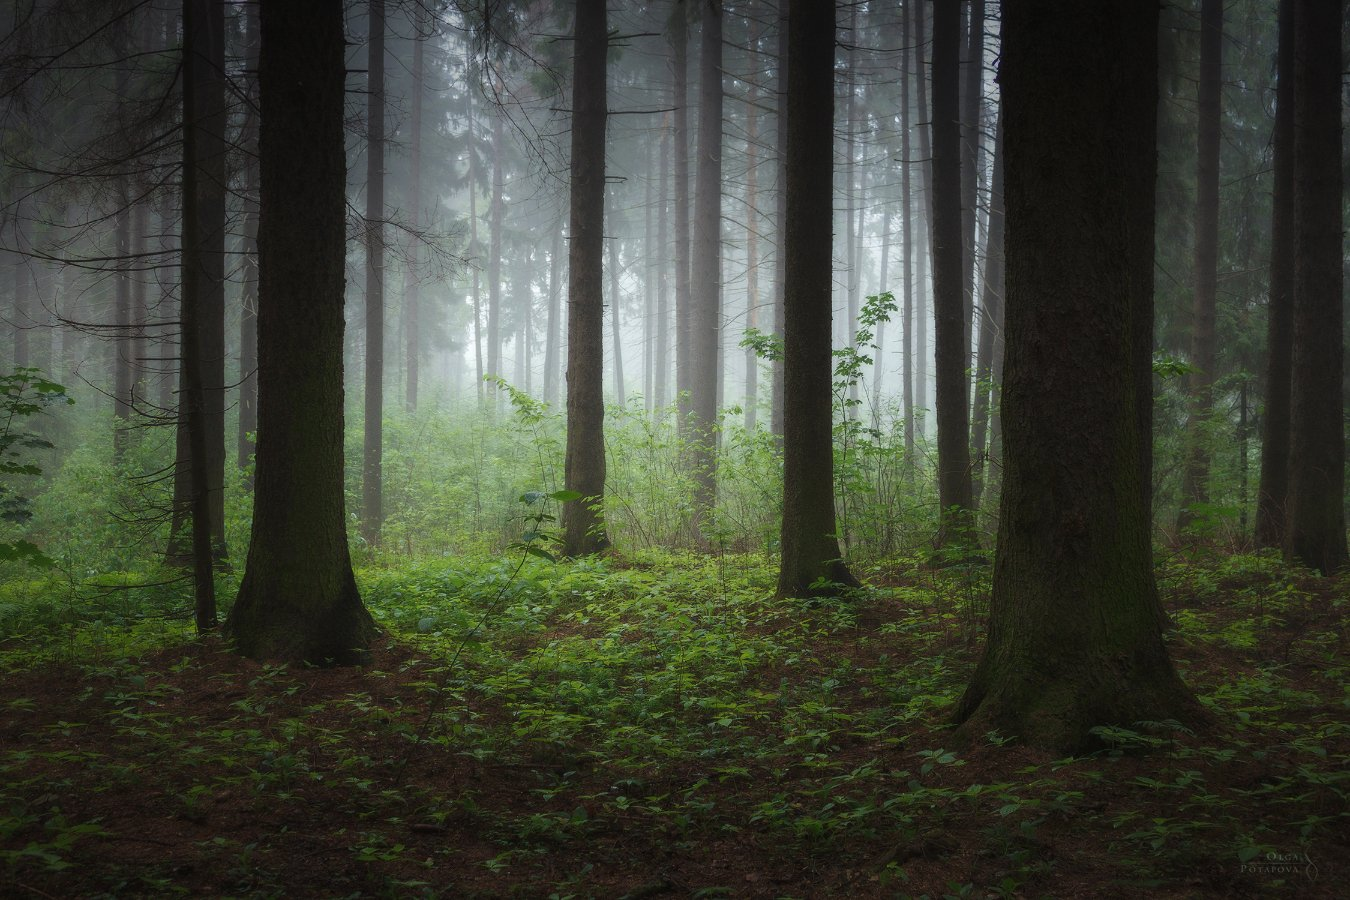 еловый лес, зеленоград, туман, зелень, лето, Ольга Потапова